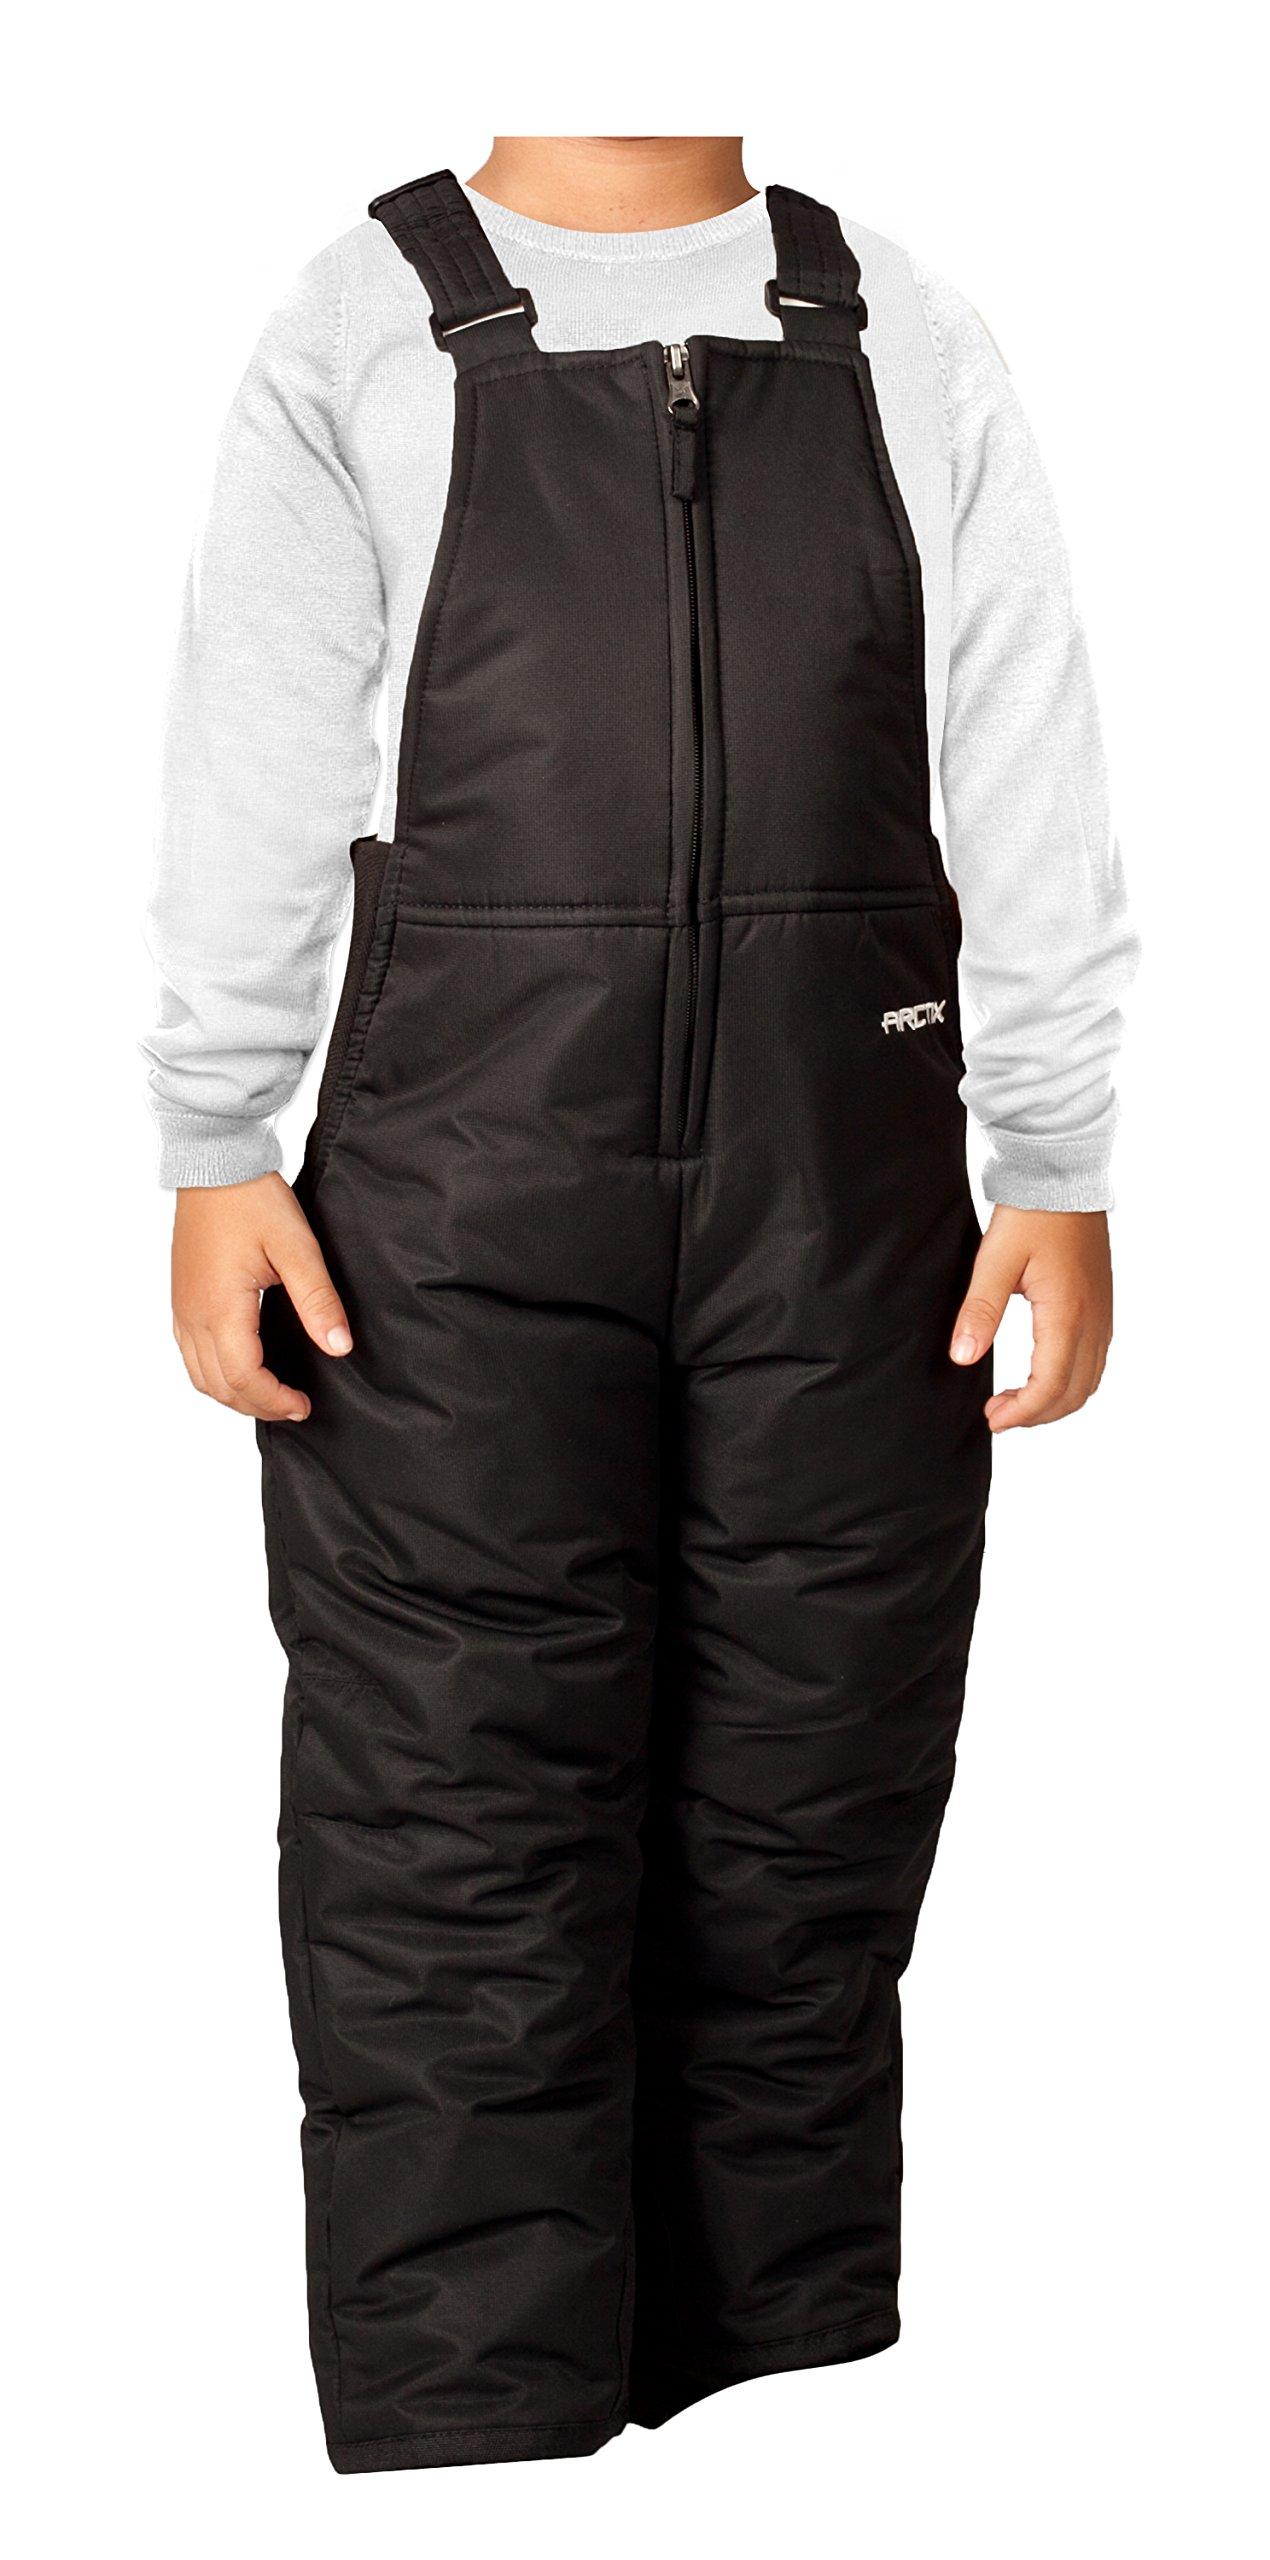 Arctix Infant-Toddler Chest High Snow Bib Overalls, Black, 3T by Arctix